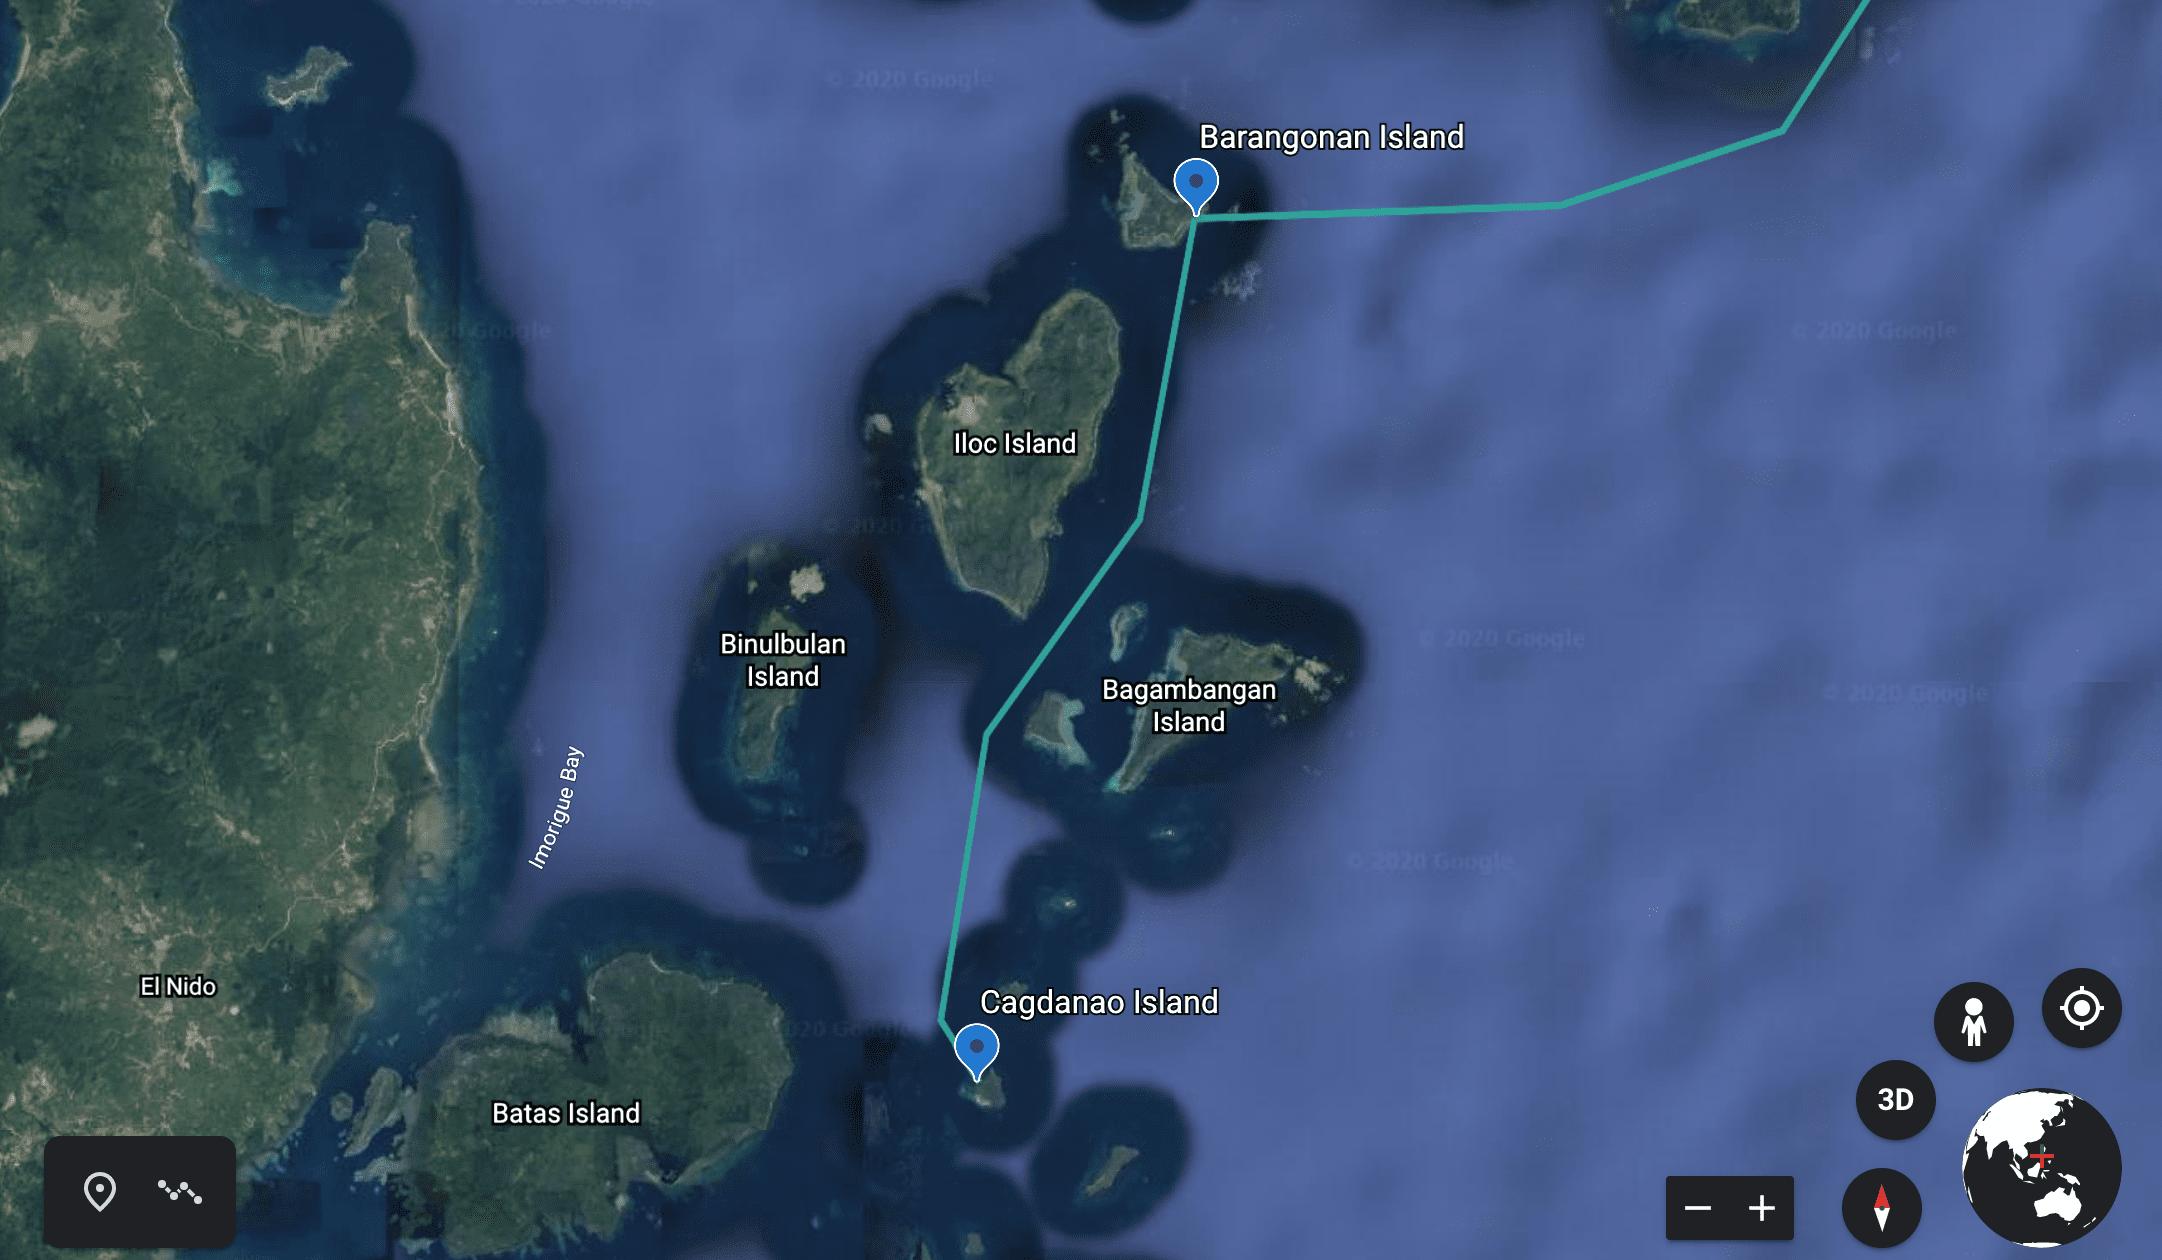 Cagdanao Island